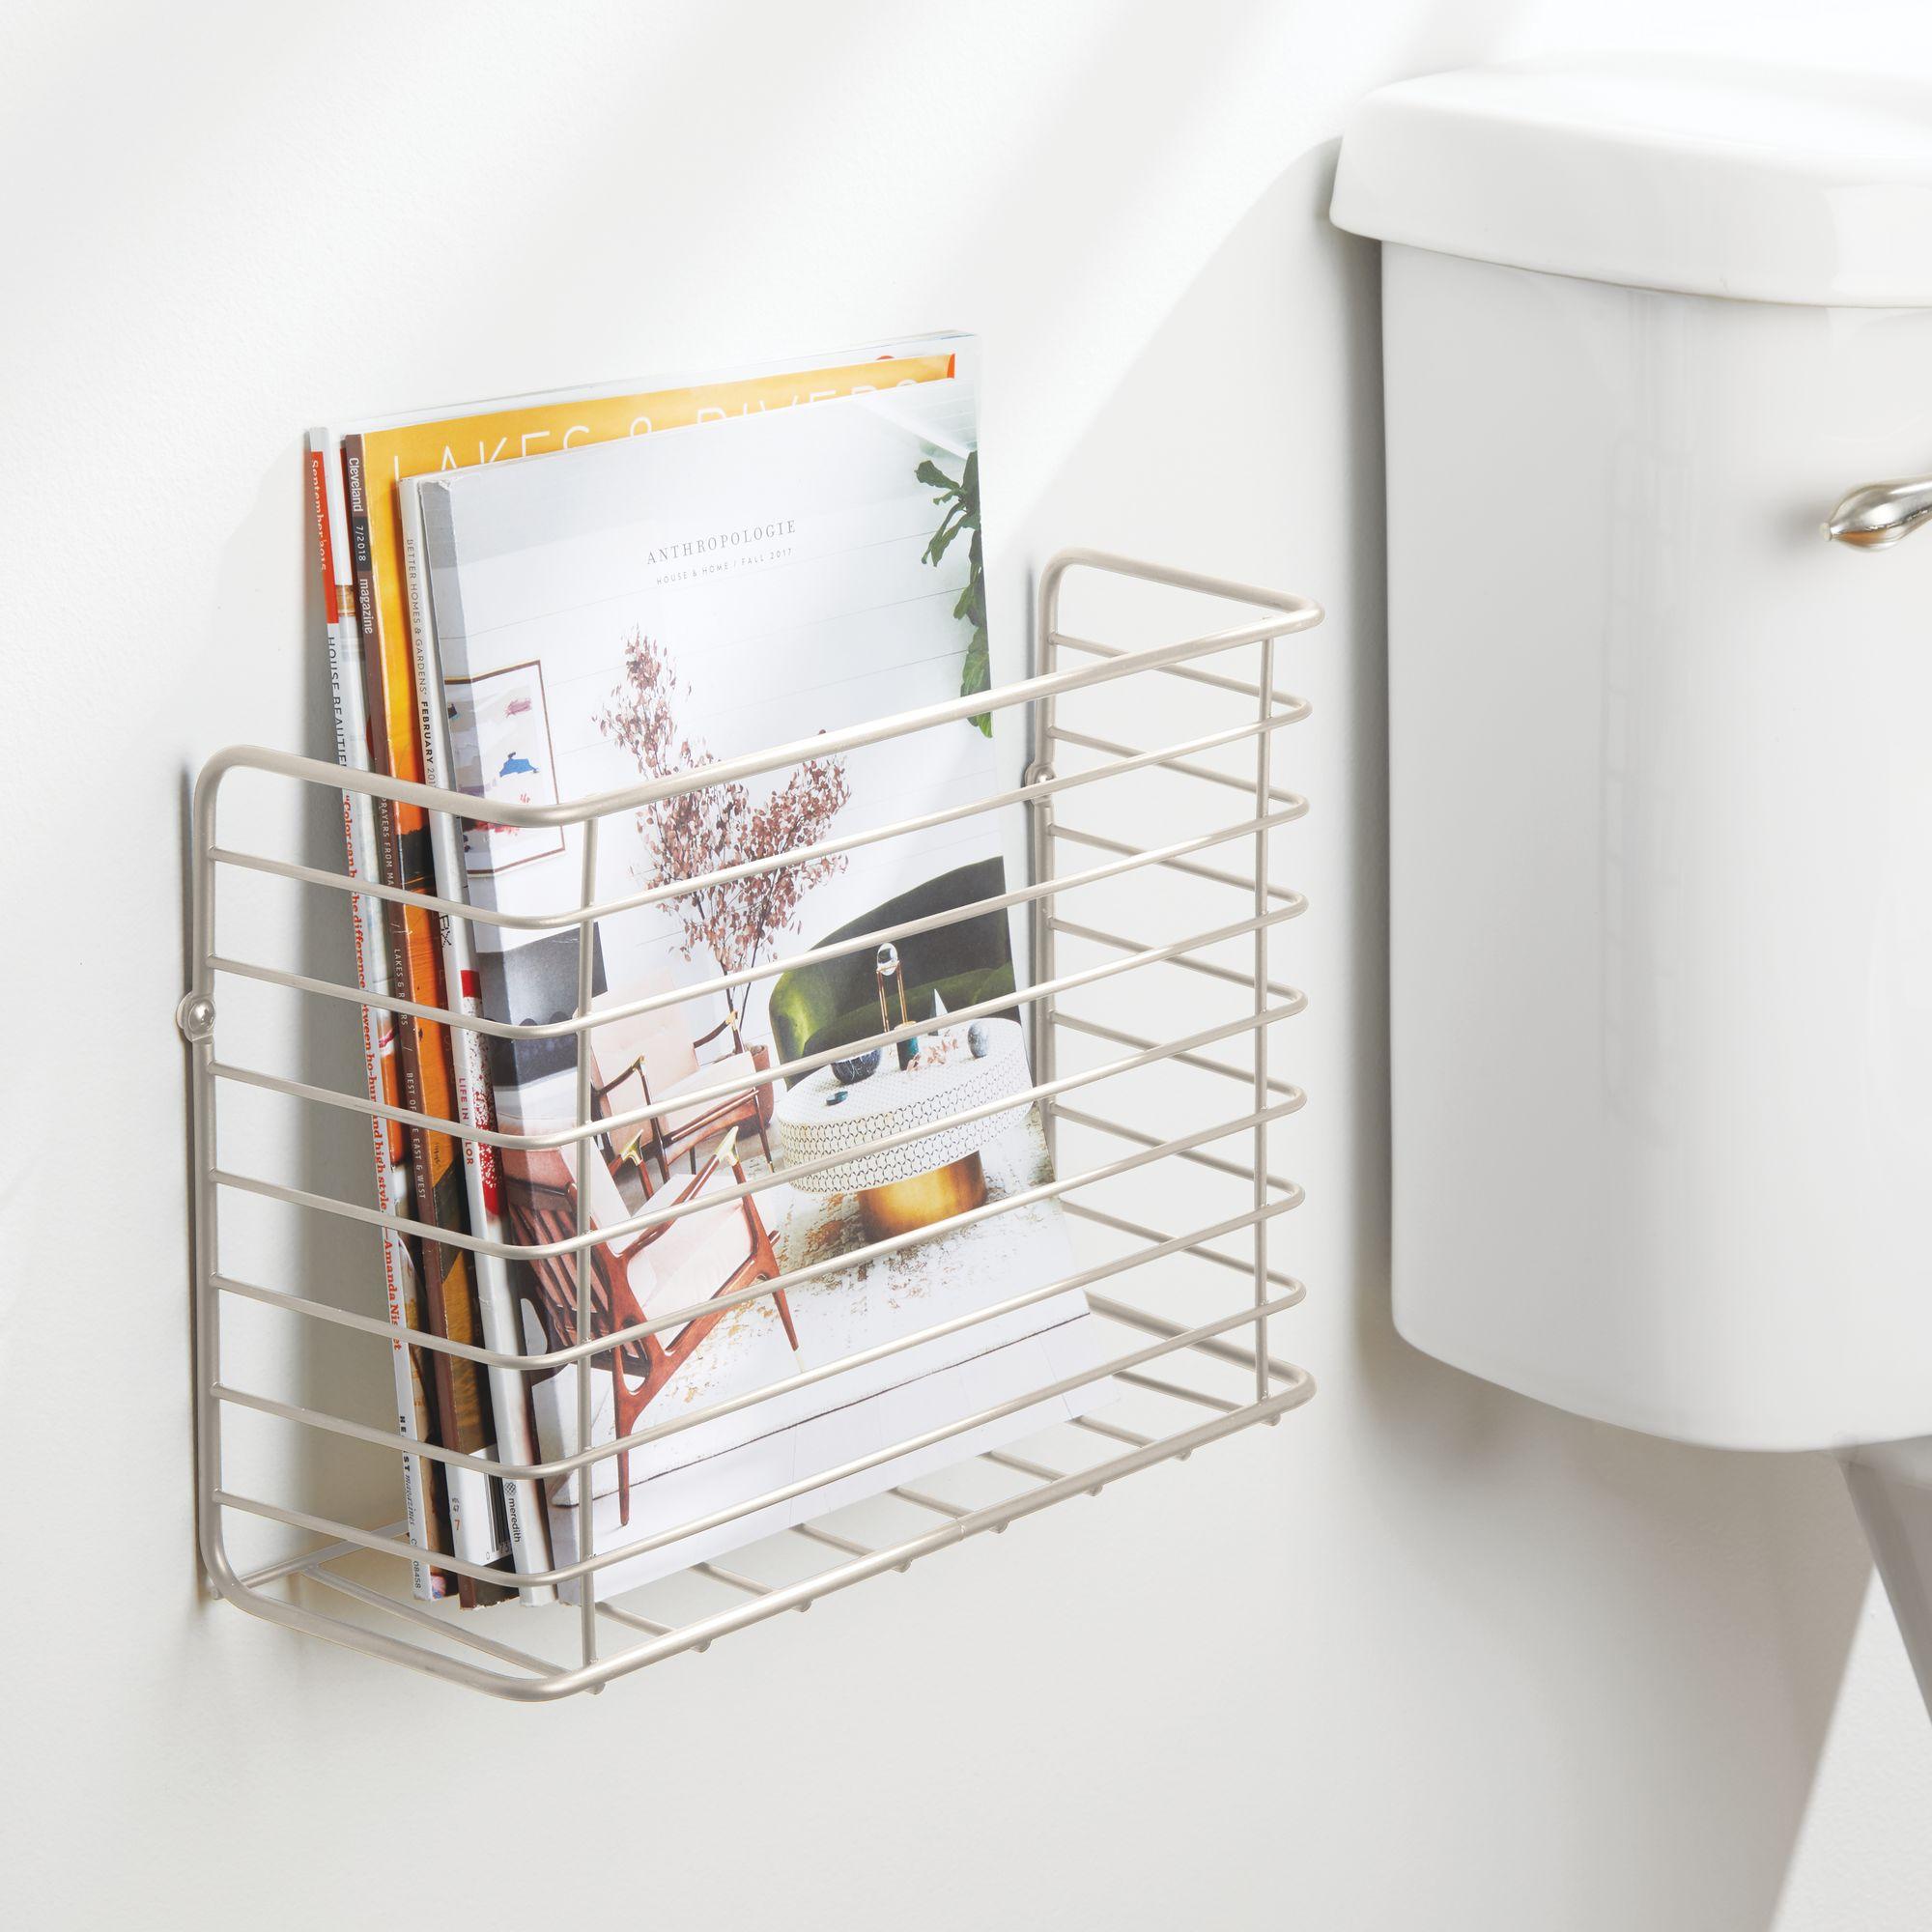 mDesign-Metal-Wall-Mount-Magazine-Holder-Storage-Organizer-Rack thumbnail 50